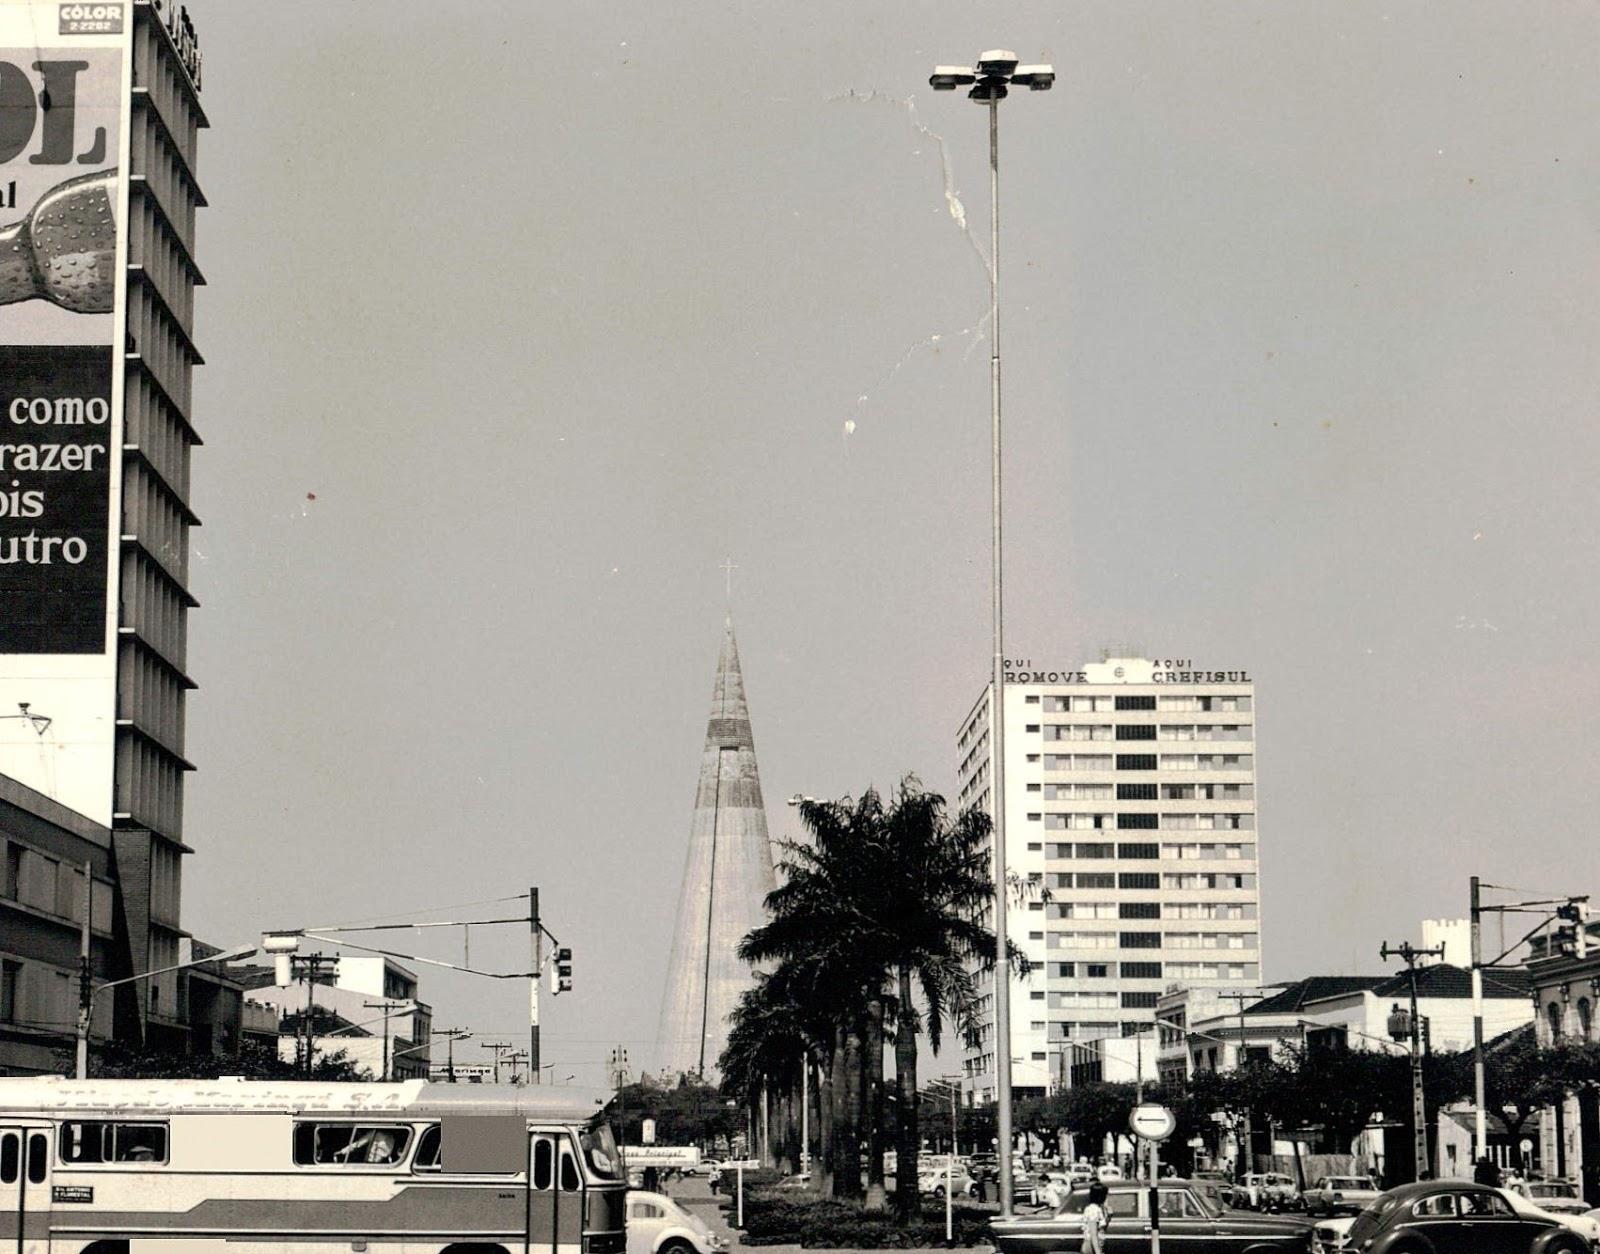 Avenida Getúlio Vargas - 1979